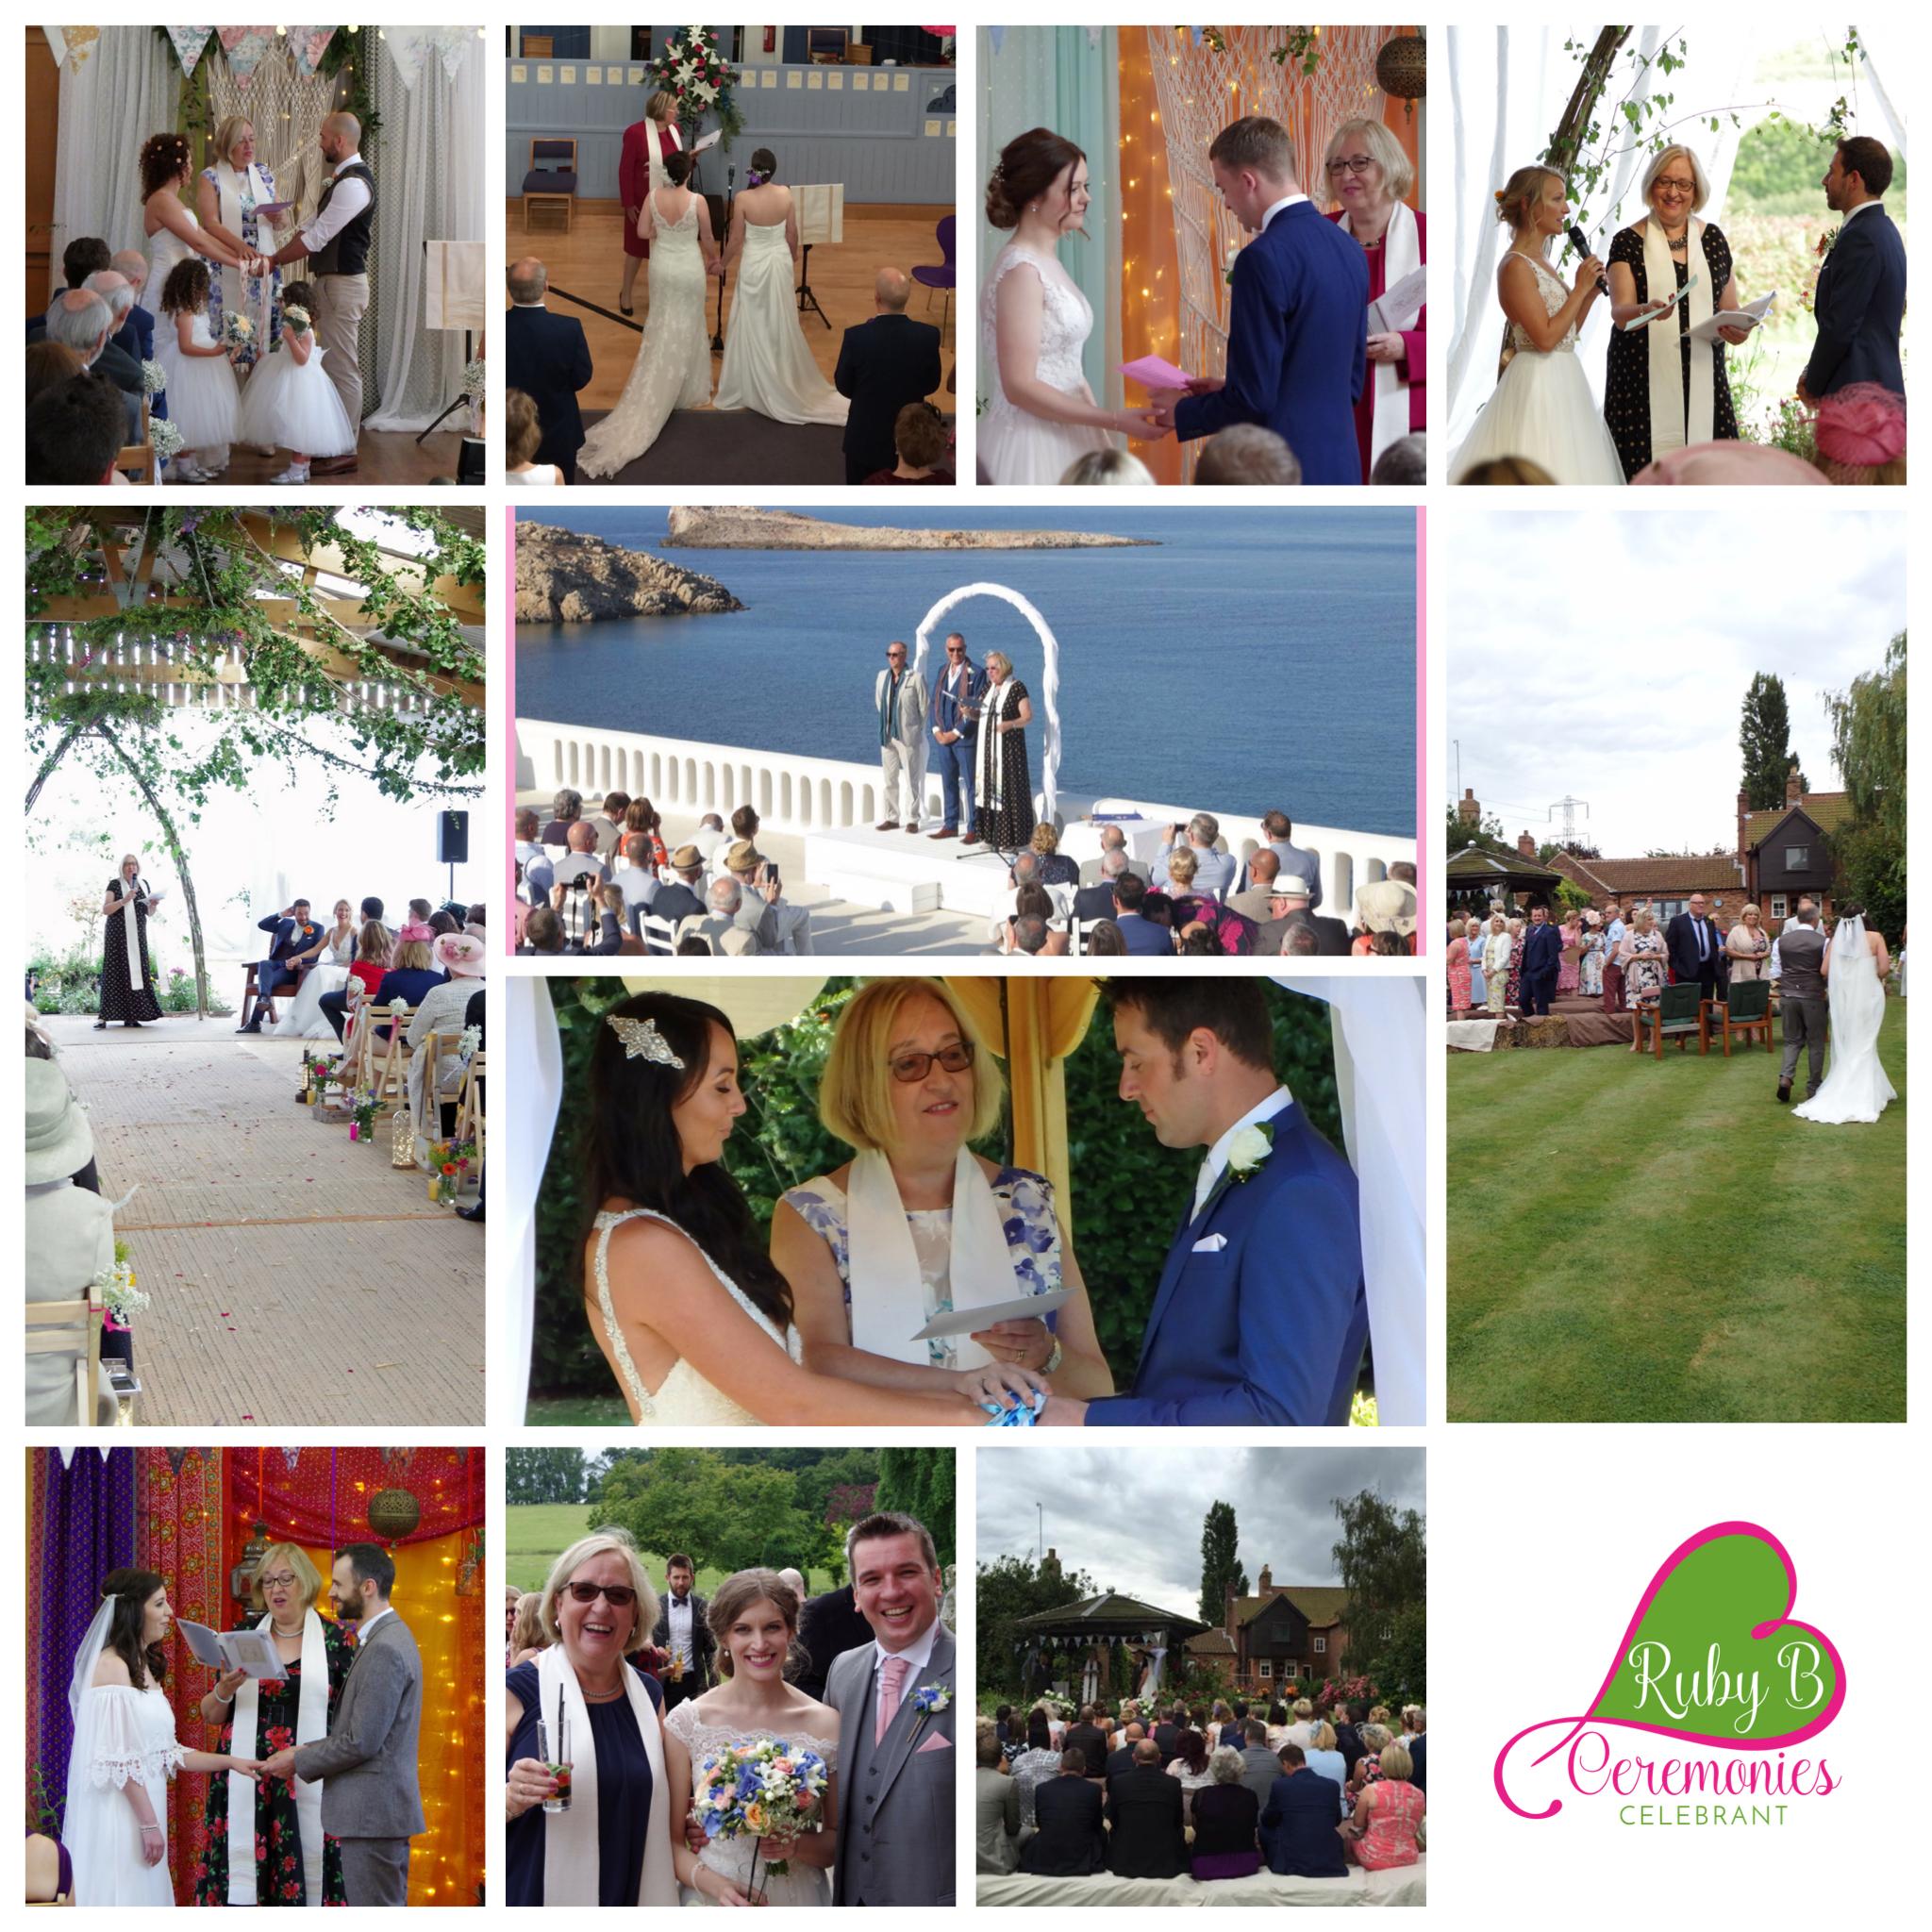 Wedding Celebrant Nottinghamshire, Derbyshire, Leicestershire, Lincolnshire